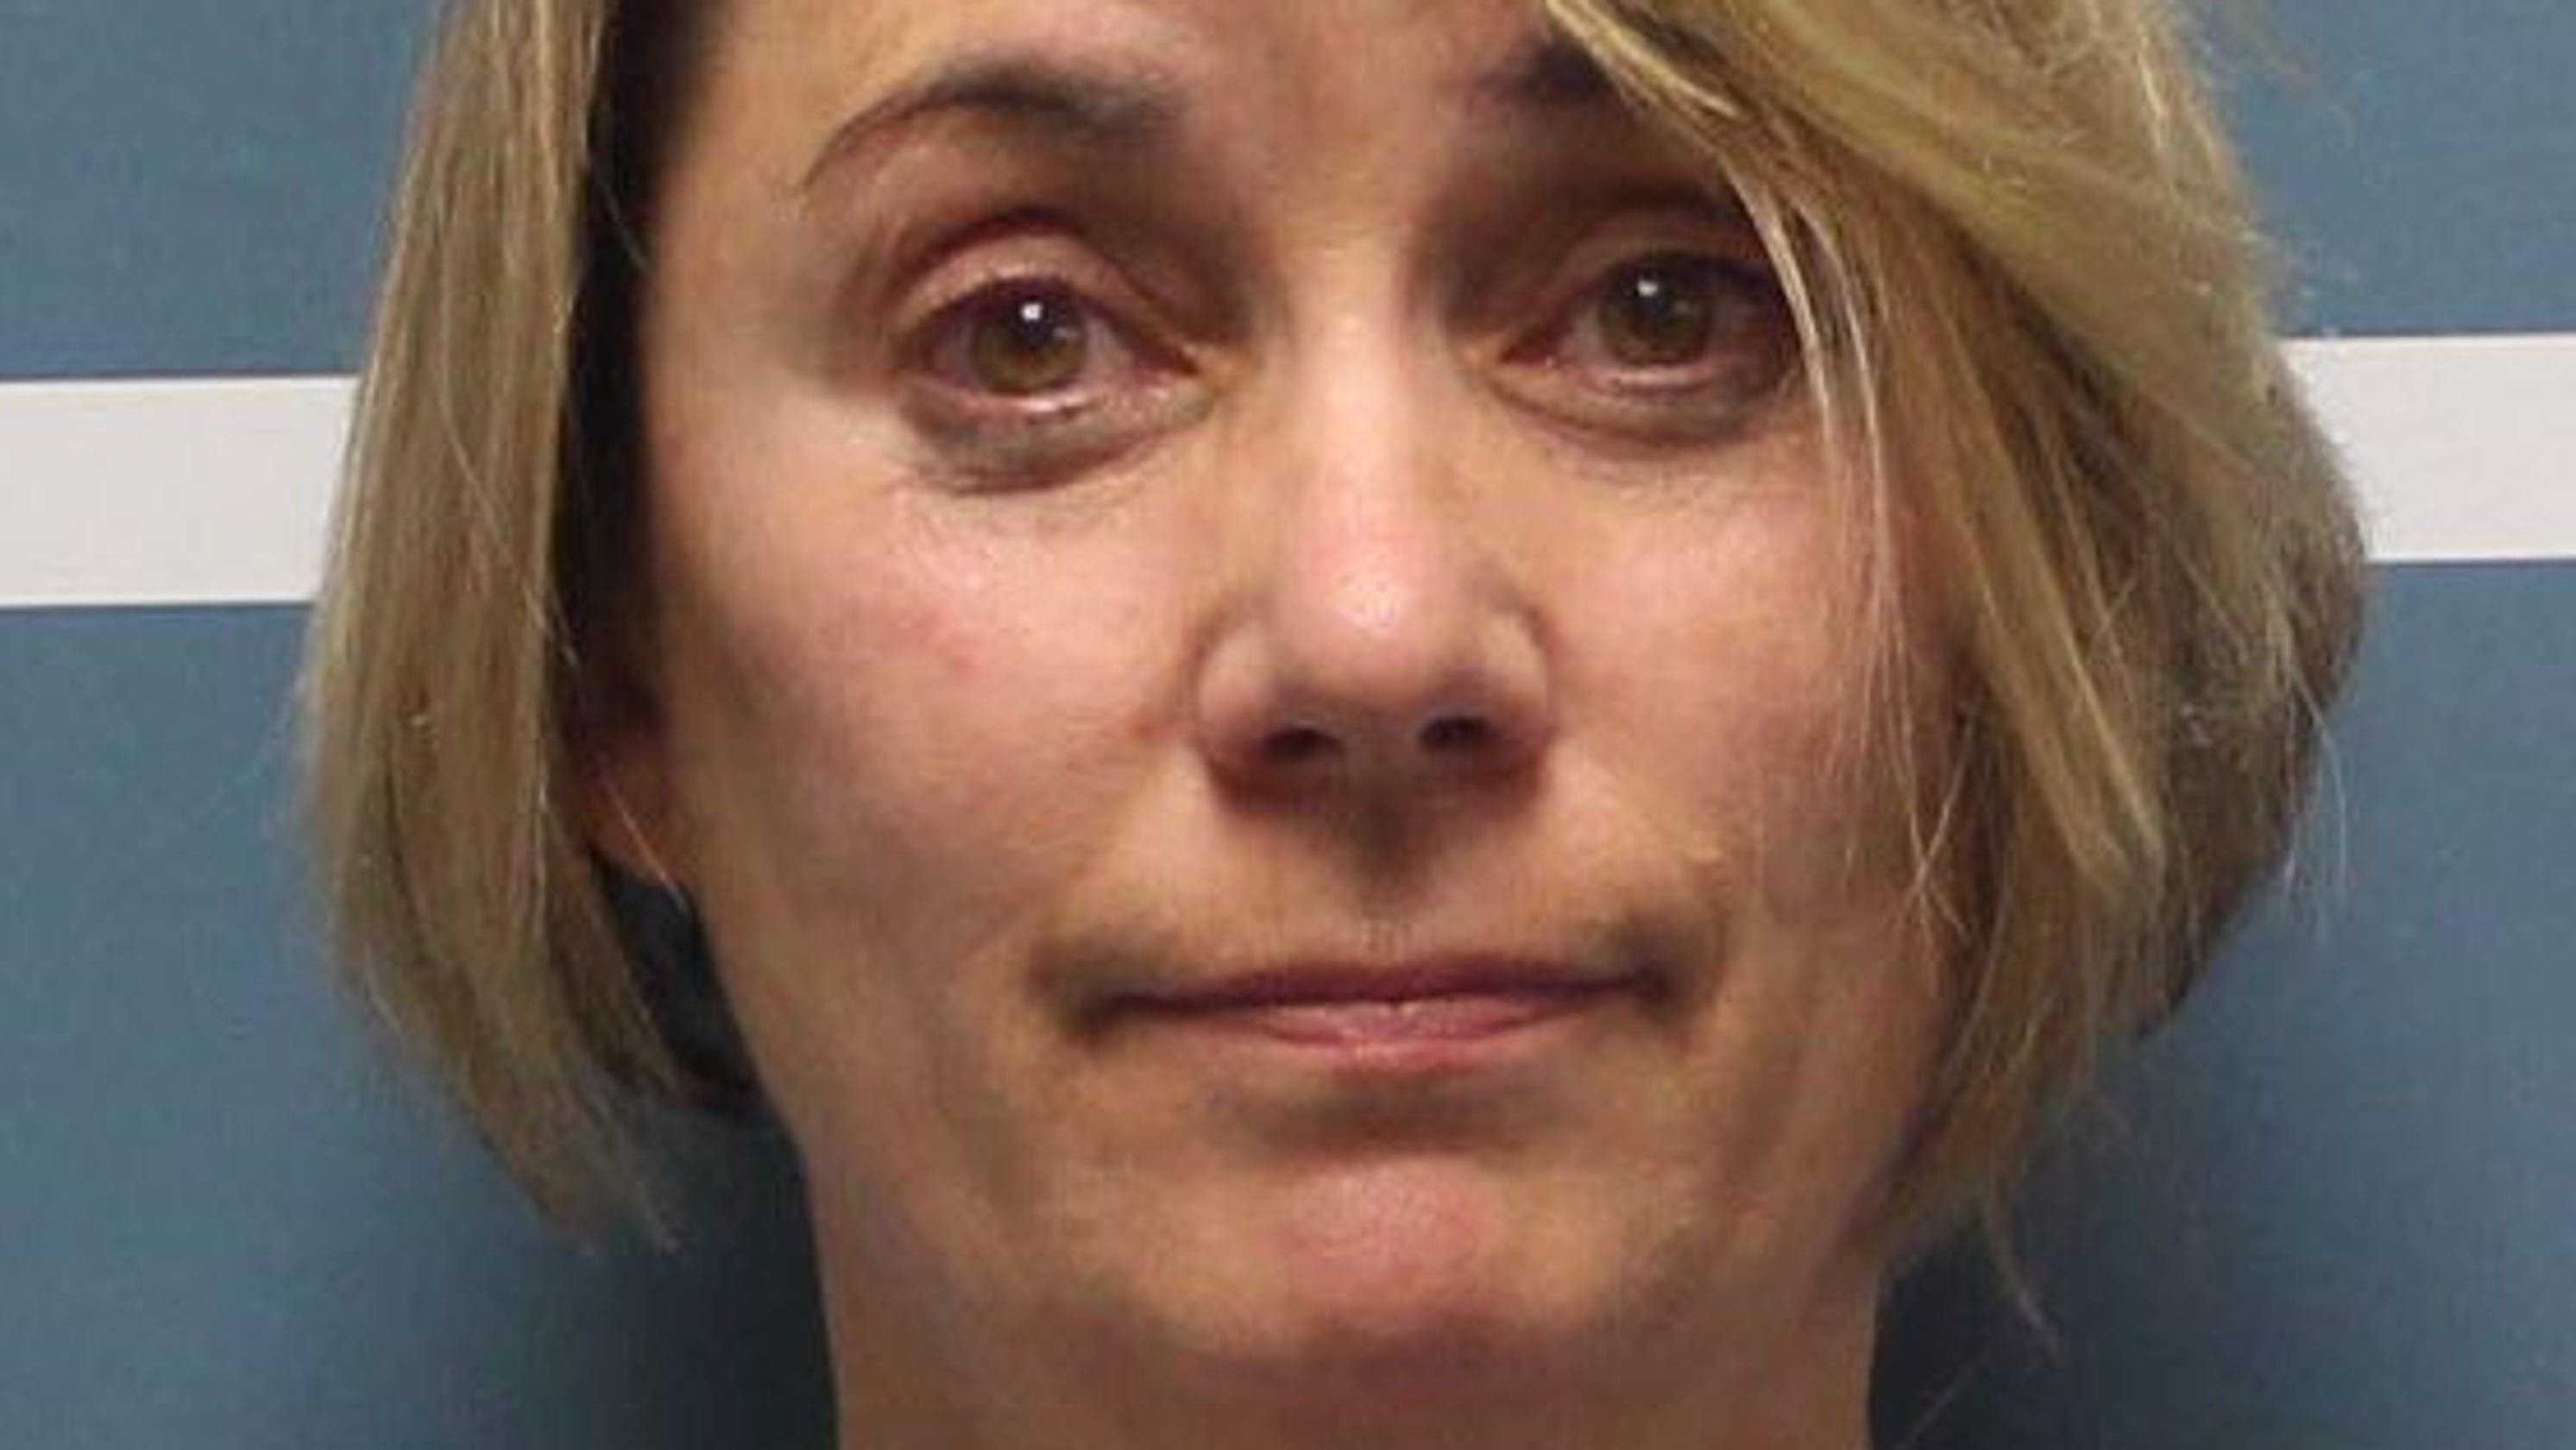 Hair chopping Visalia teacher 'will not return to her classroom'